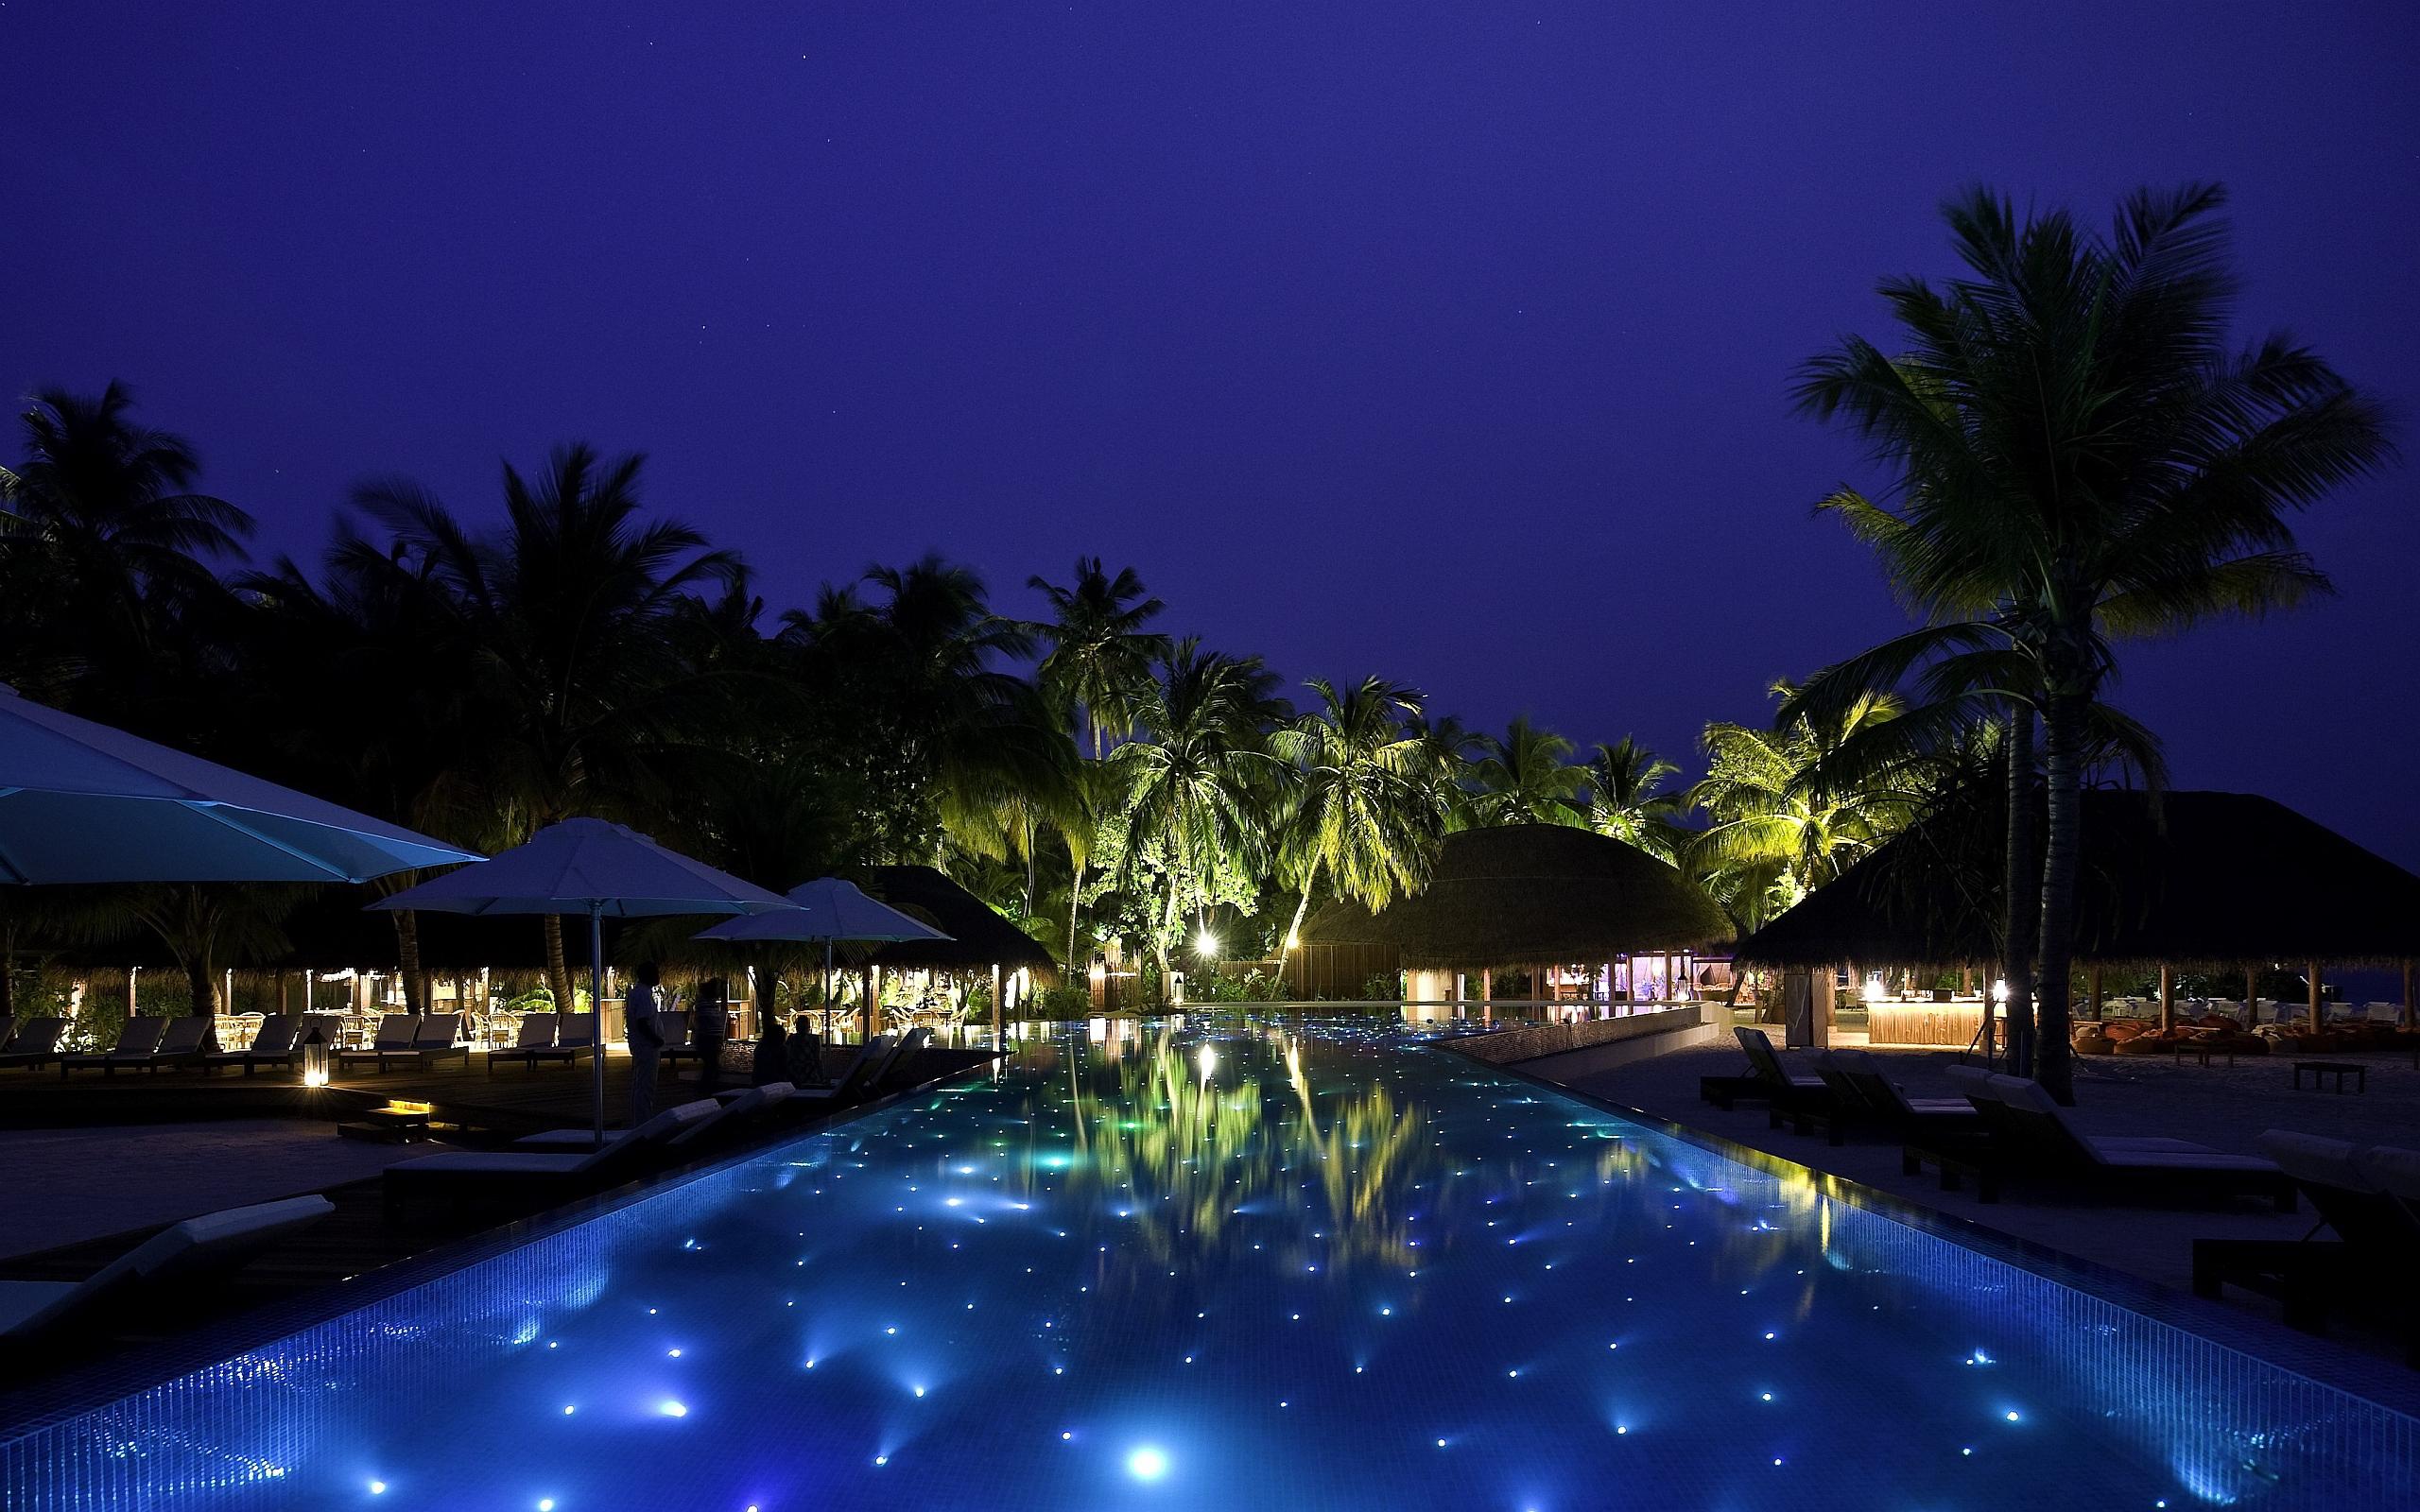 Resort pool lights